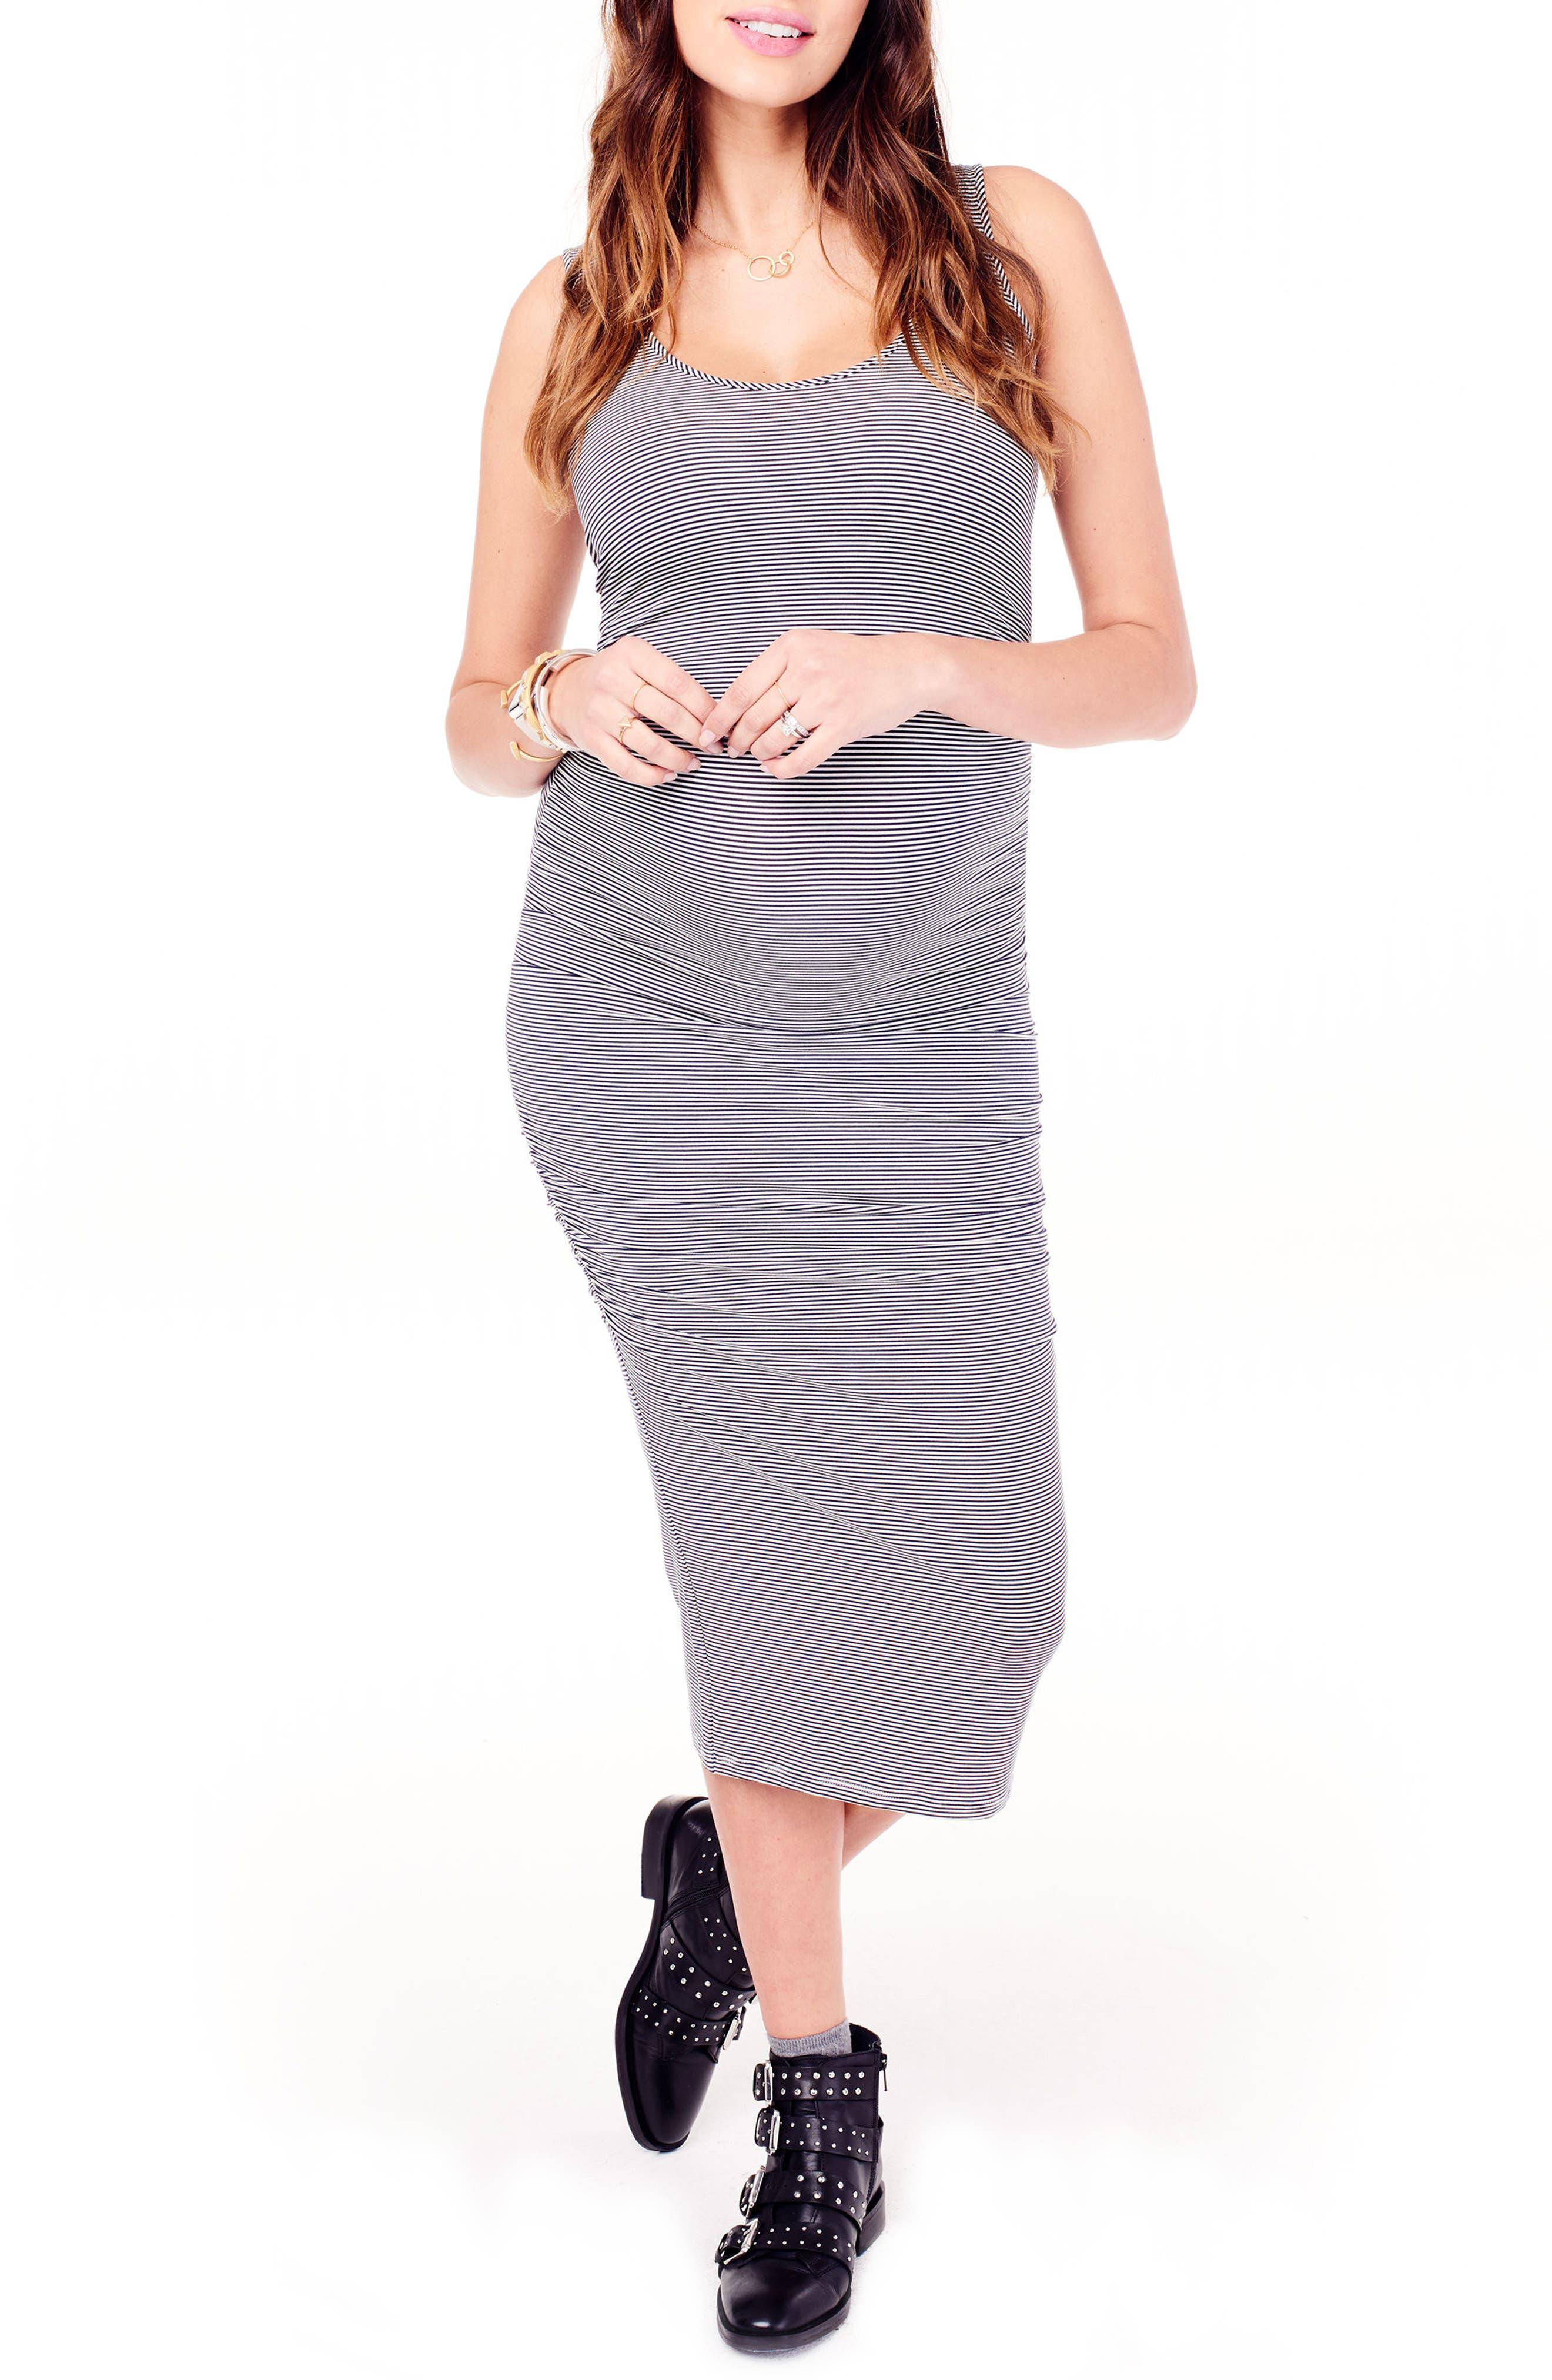 Shirred Midi Maternity Tank Dress,                             Alternate thumbnail 3, color,                             TRUE NAVY/ IVORY MICROSTRIPE